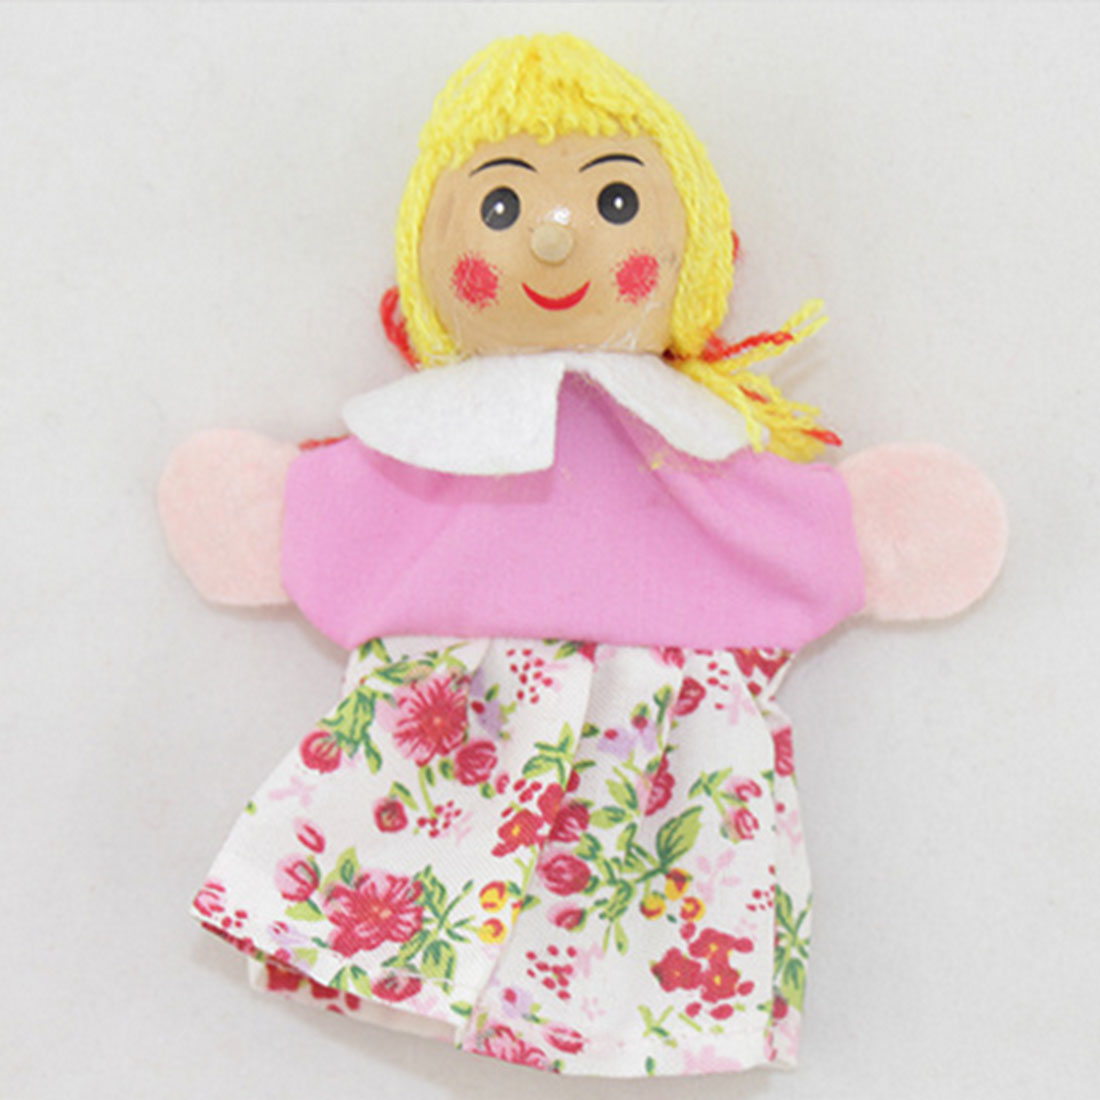 Surwish-6PCSSet-Family-Finger-Puppets-Storytelling-Doll-Kids-Children-Baby-Educational-Toys-1